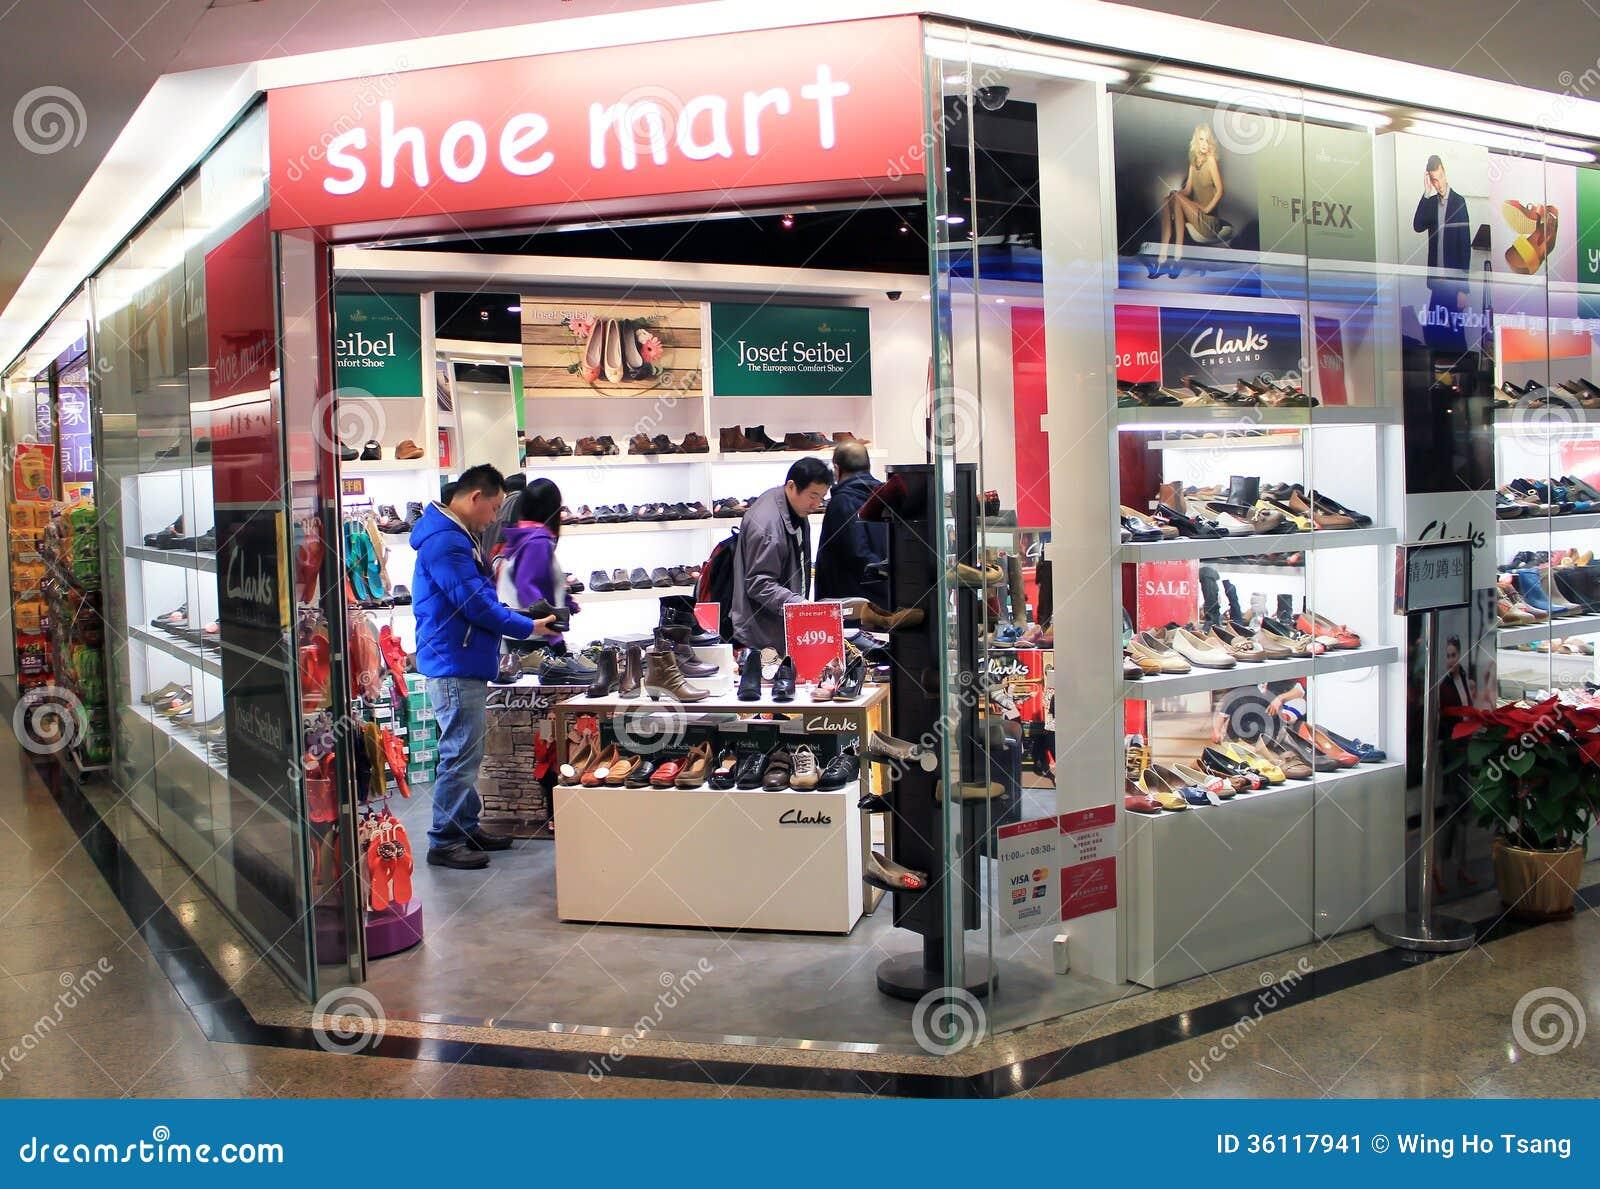 Shoe mart shop, located in Kwai Chung Centre, Hong Kong. shoe mart is